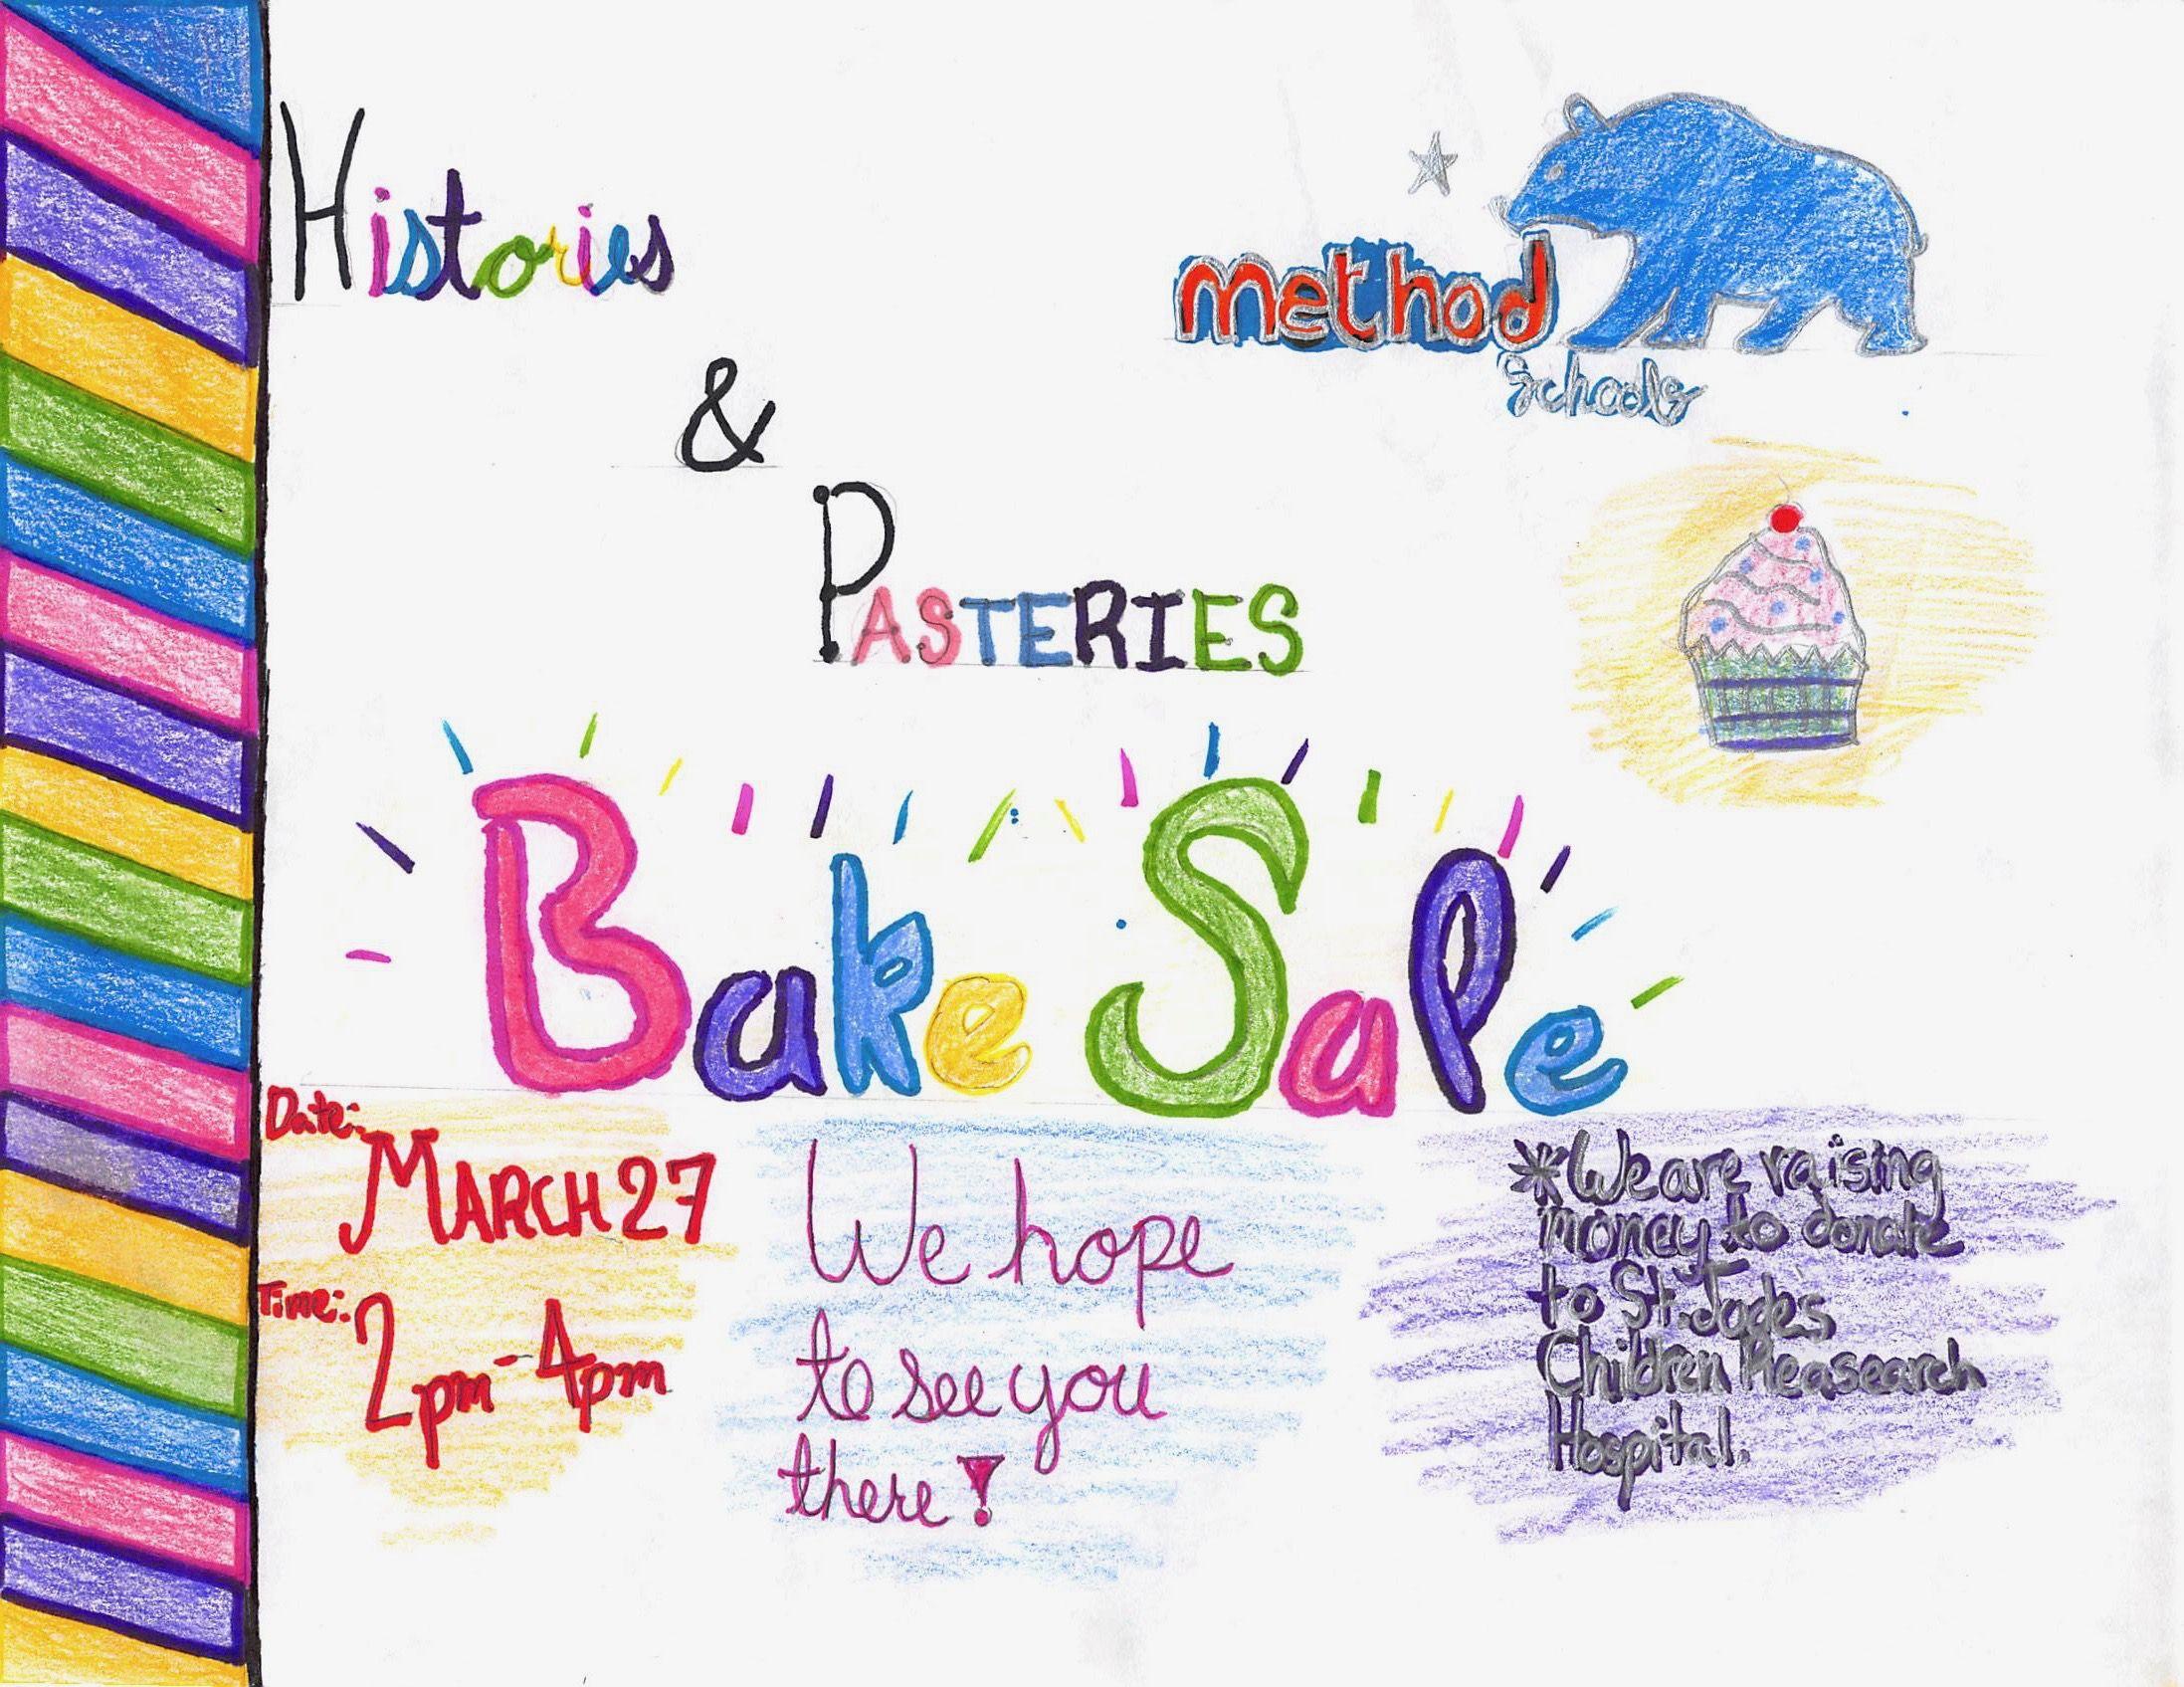 Bake Sale Flyer.jpg